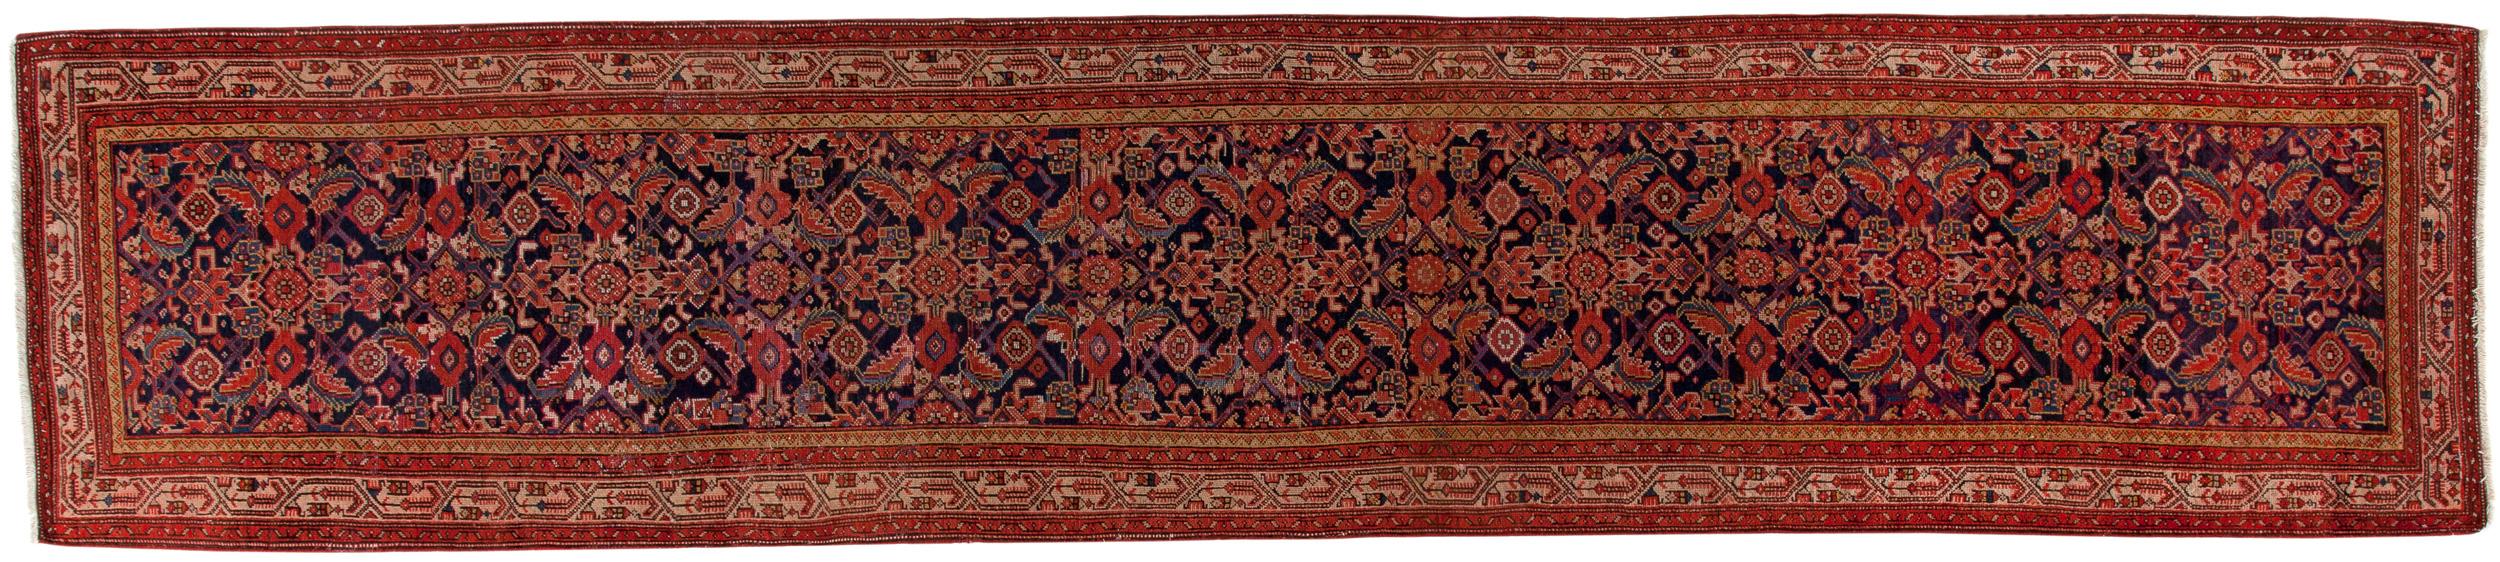 Classic Art Persian Style Runner